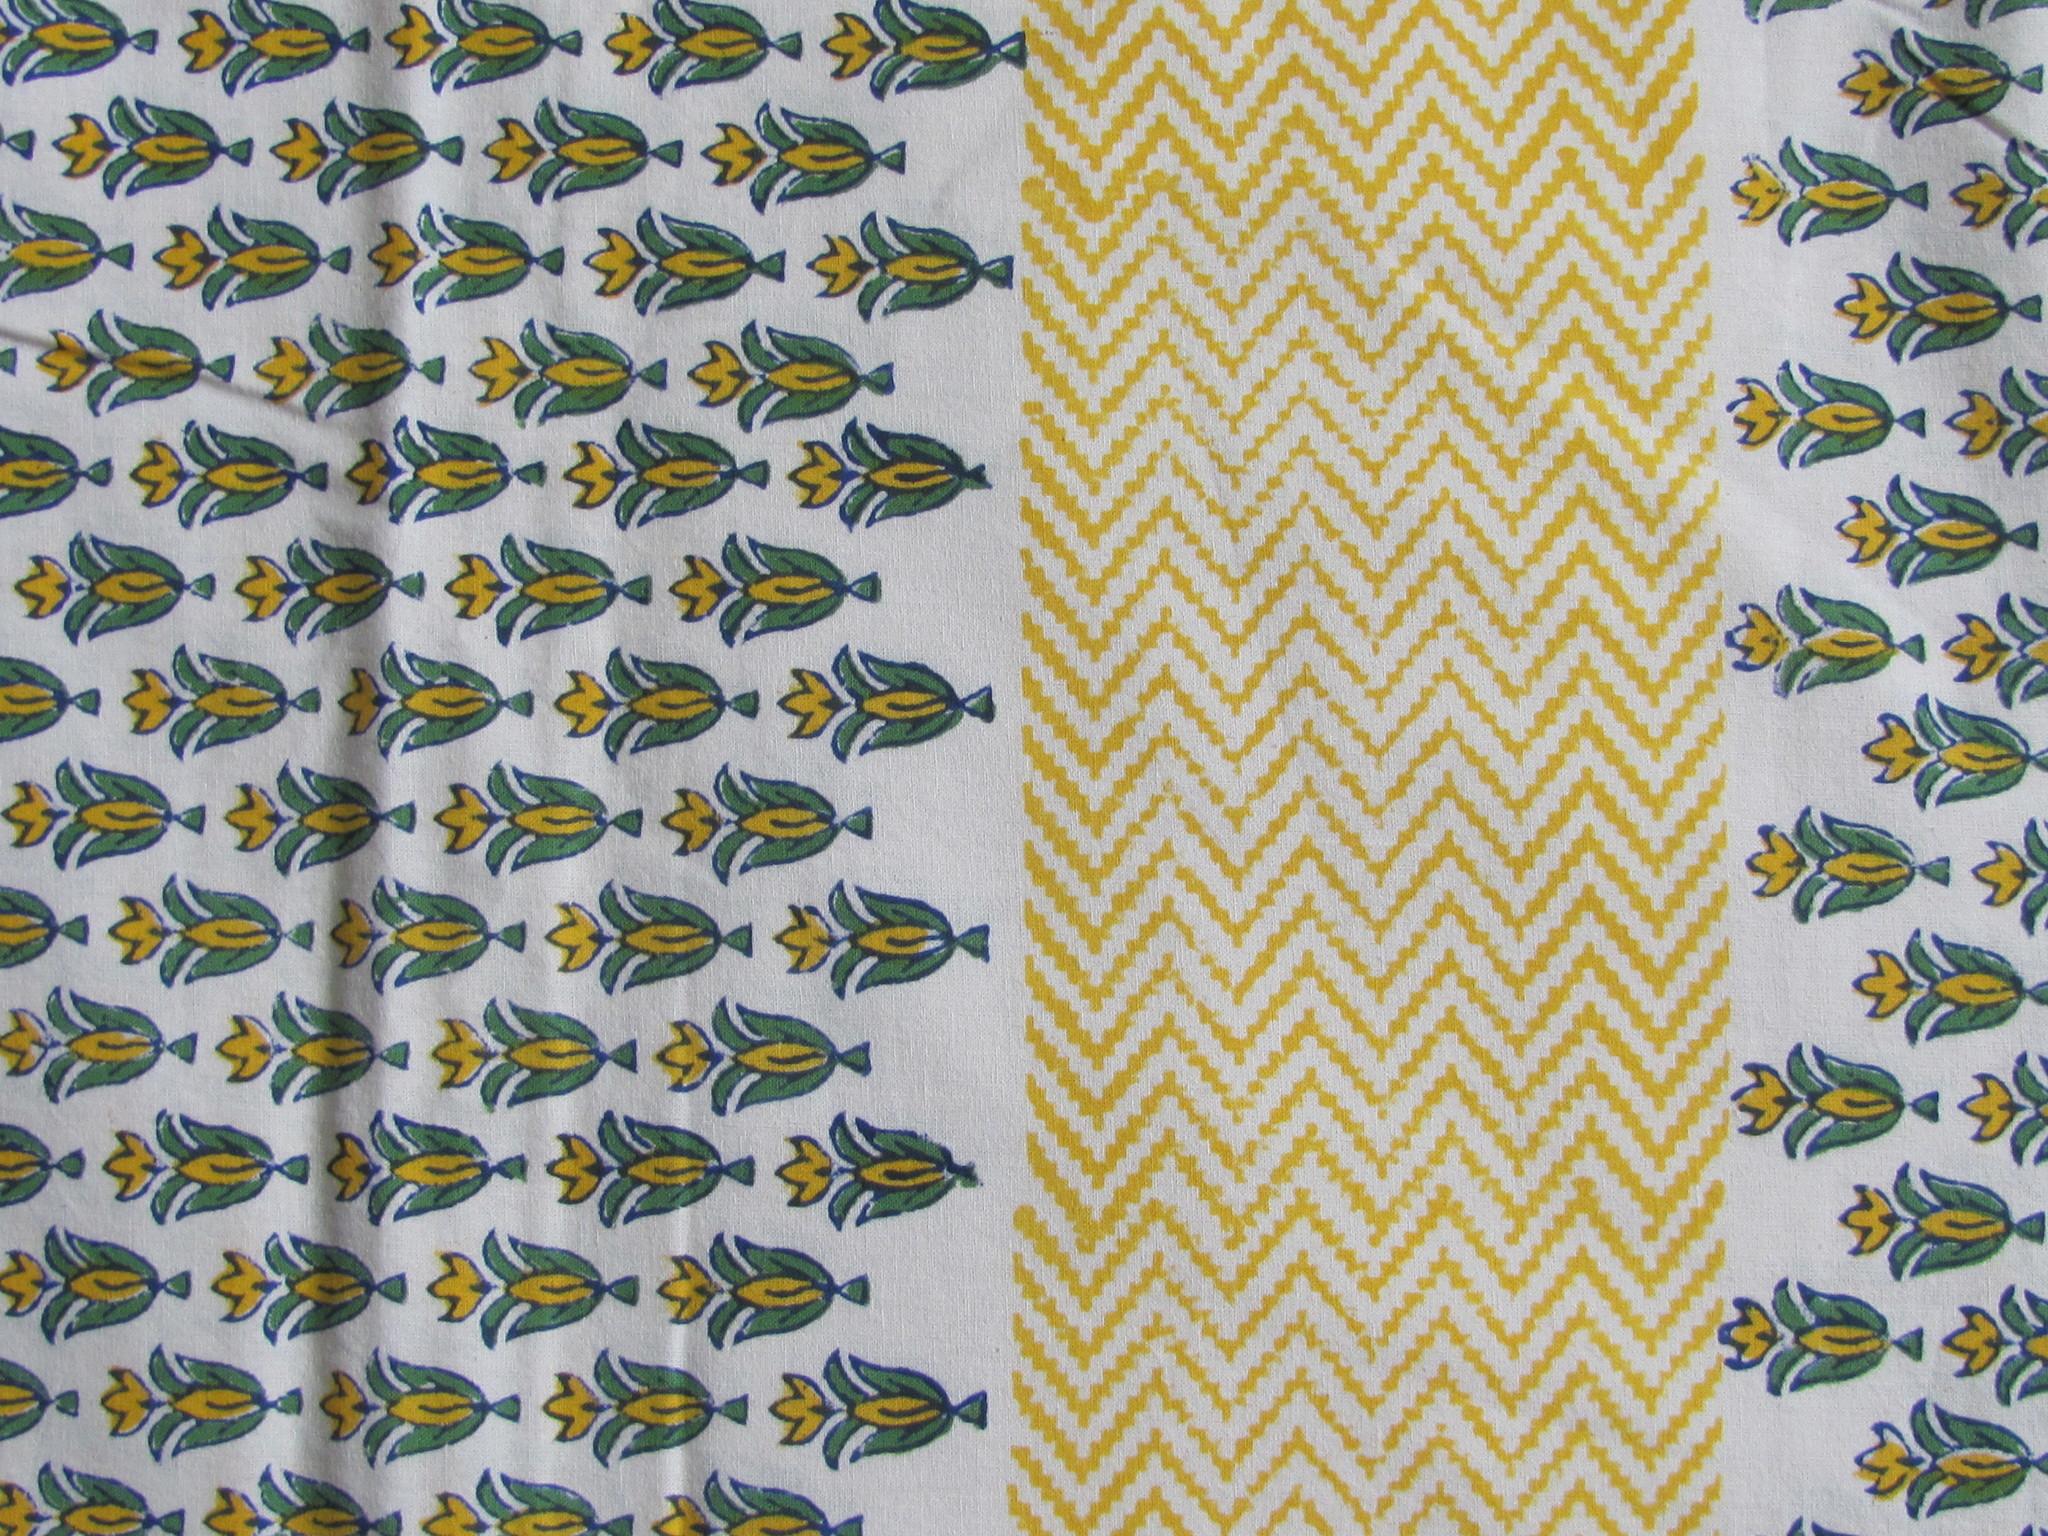 Bedsheet bohemian  on the bed, grand foulard , tabel cloth, grand foulard,